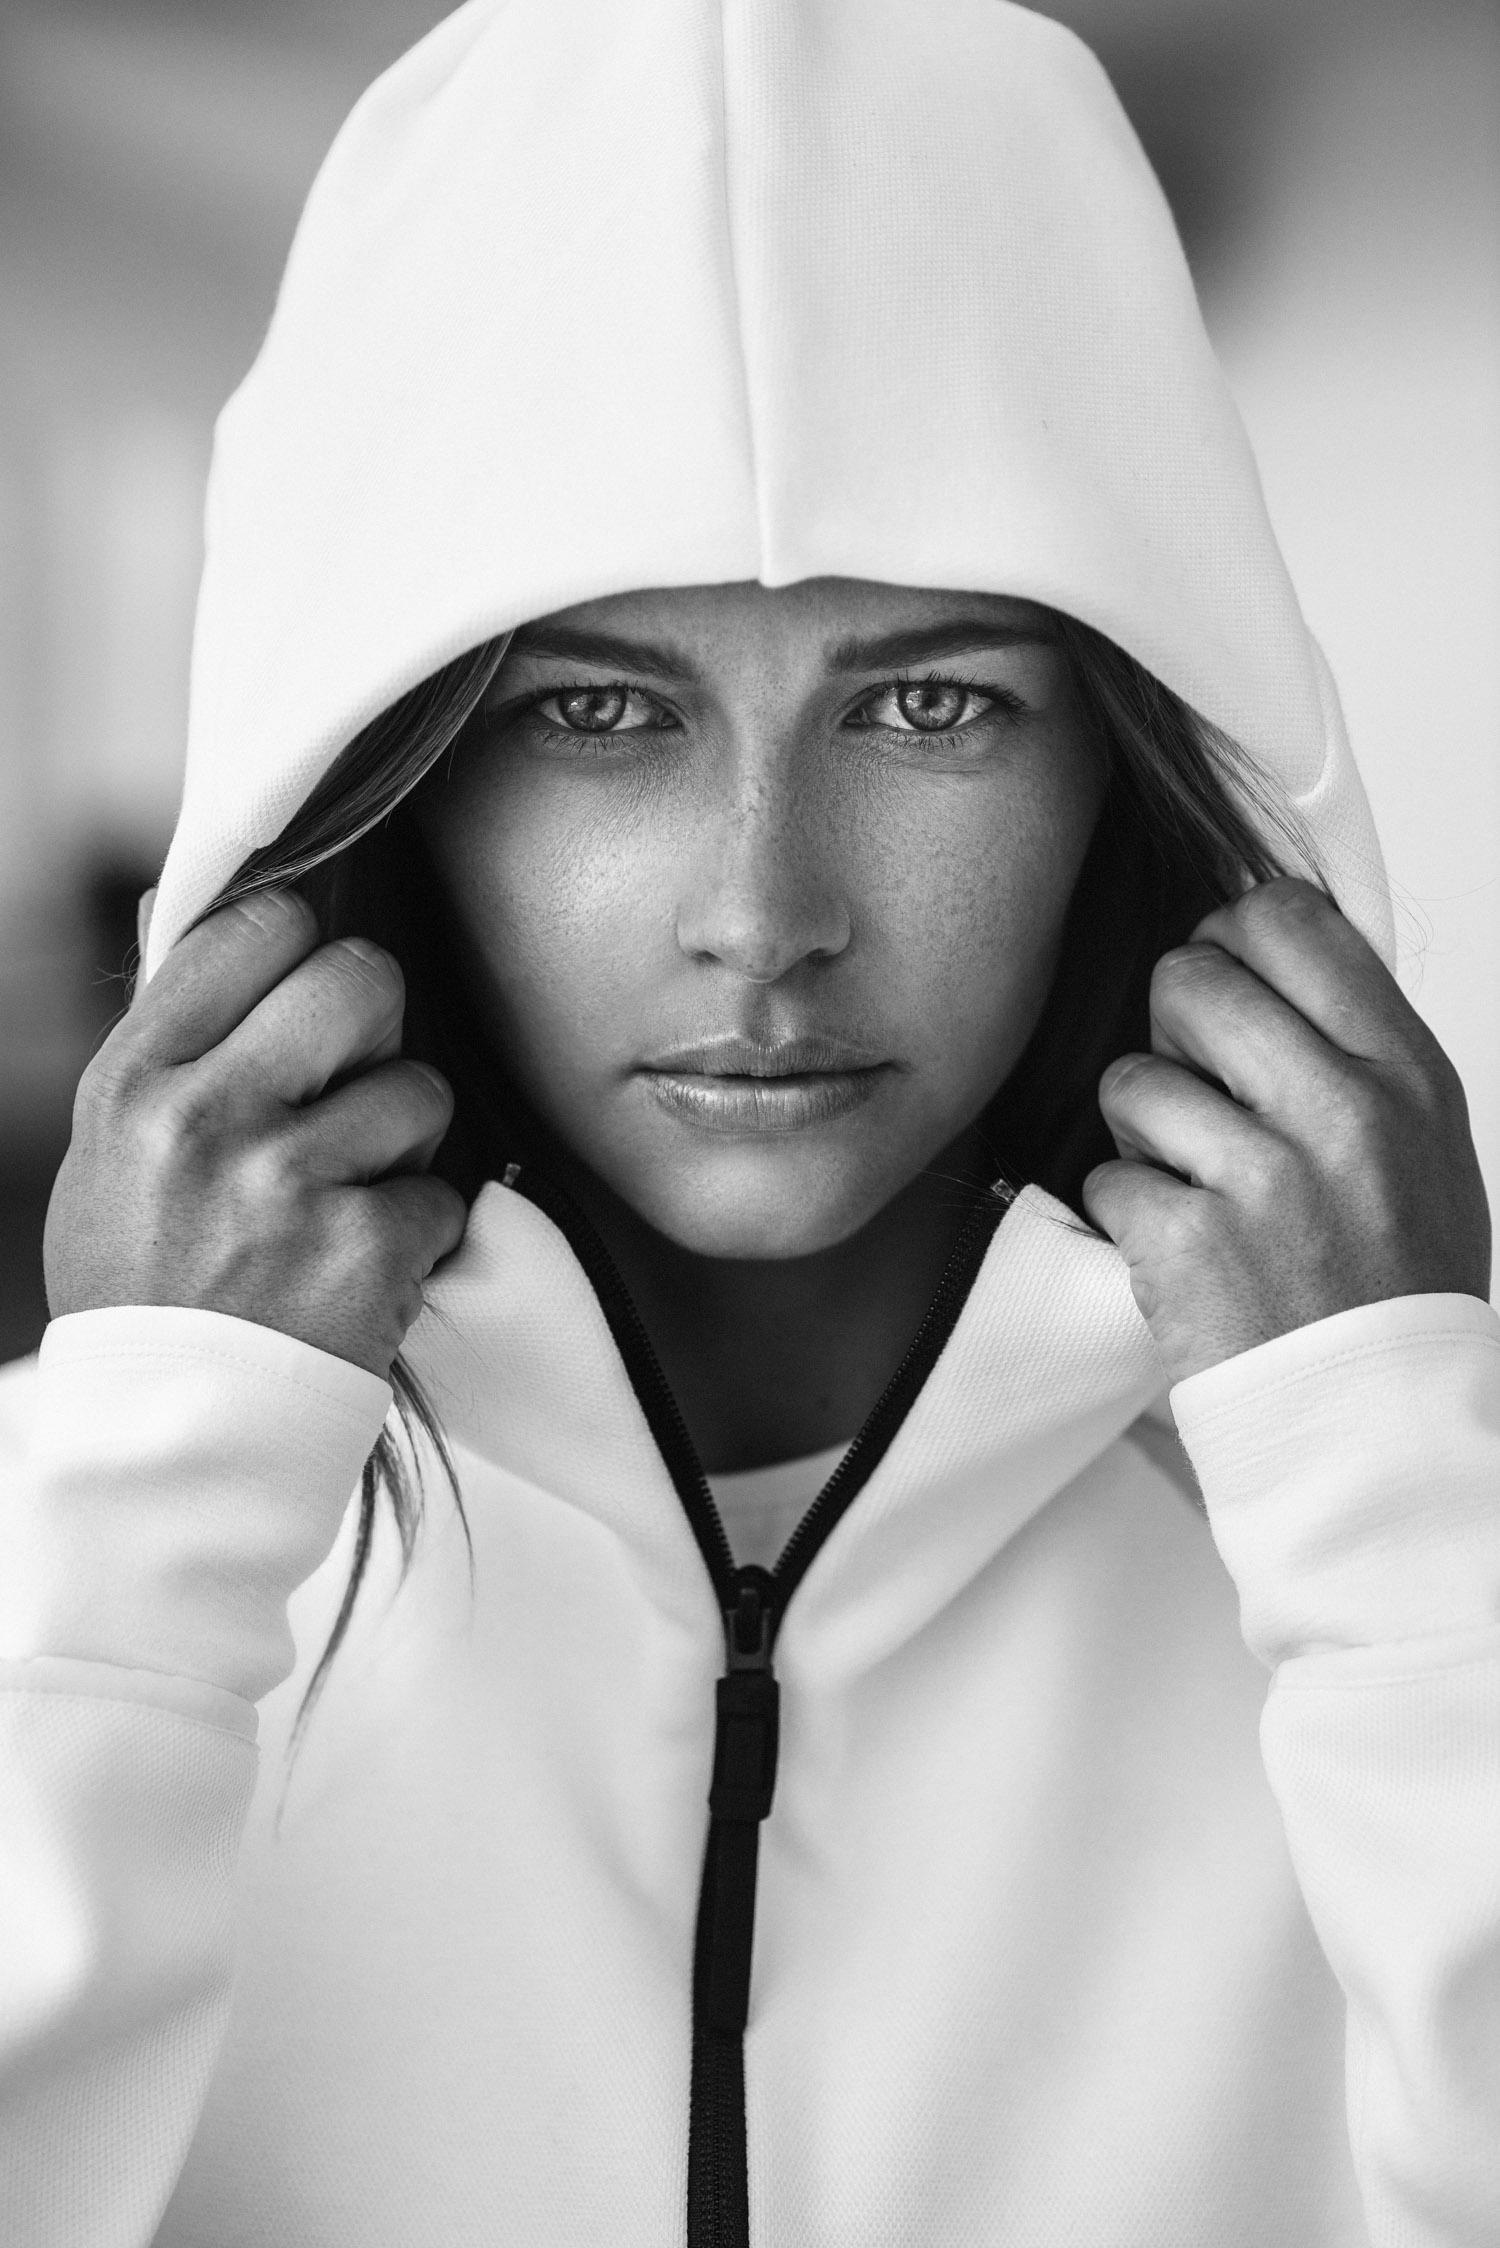 Adidas Athletes -